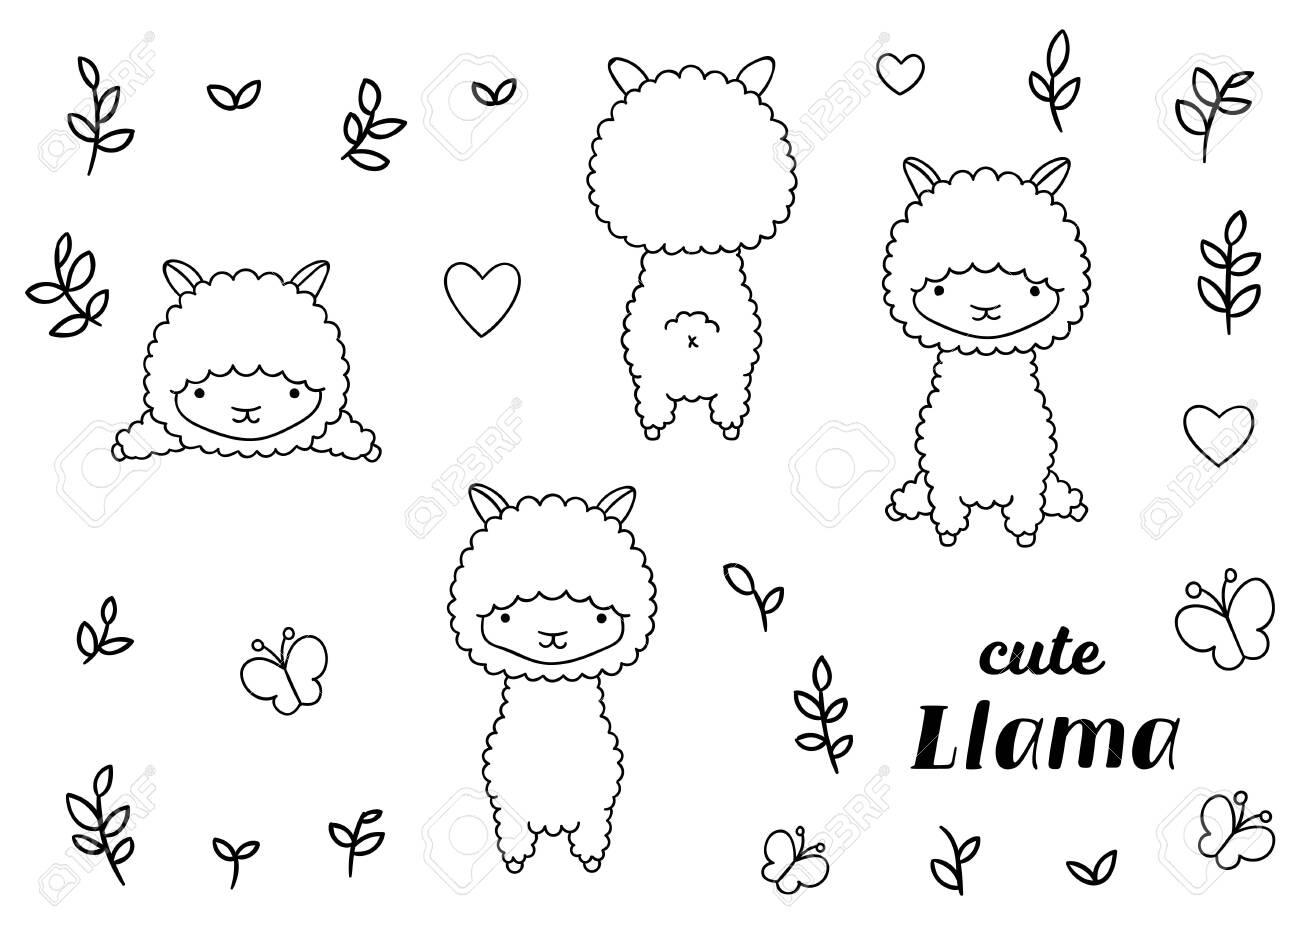 Llama shape with patterns - Llamas Adult Coloring Pages | 935x1300